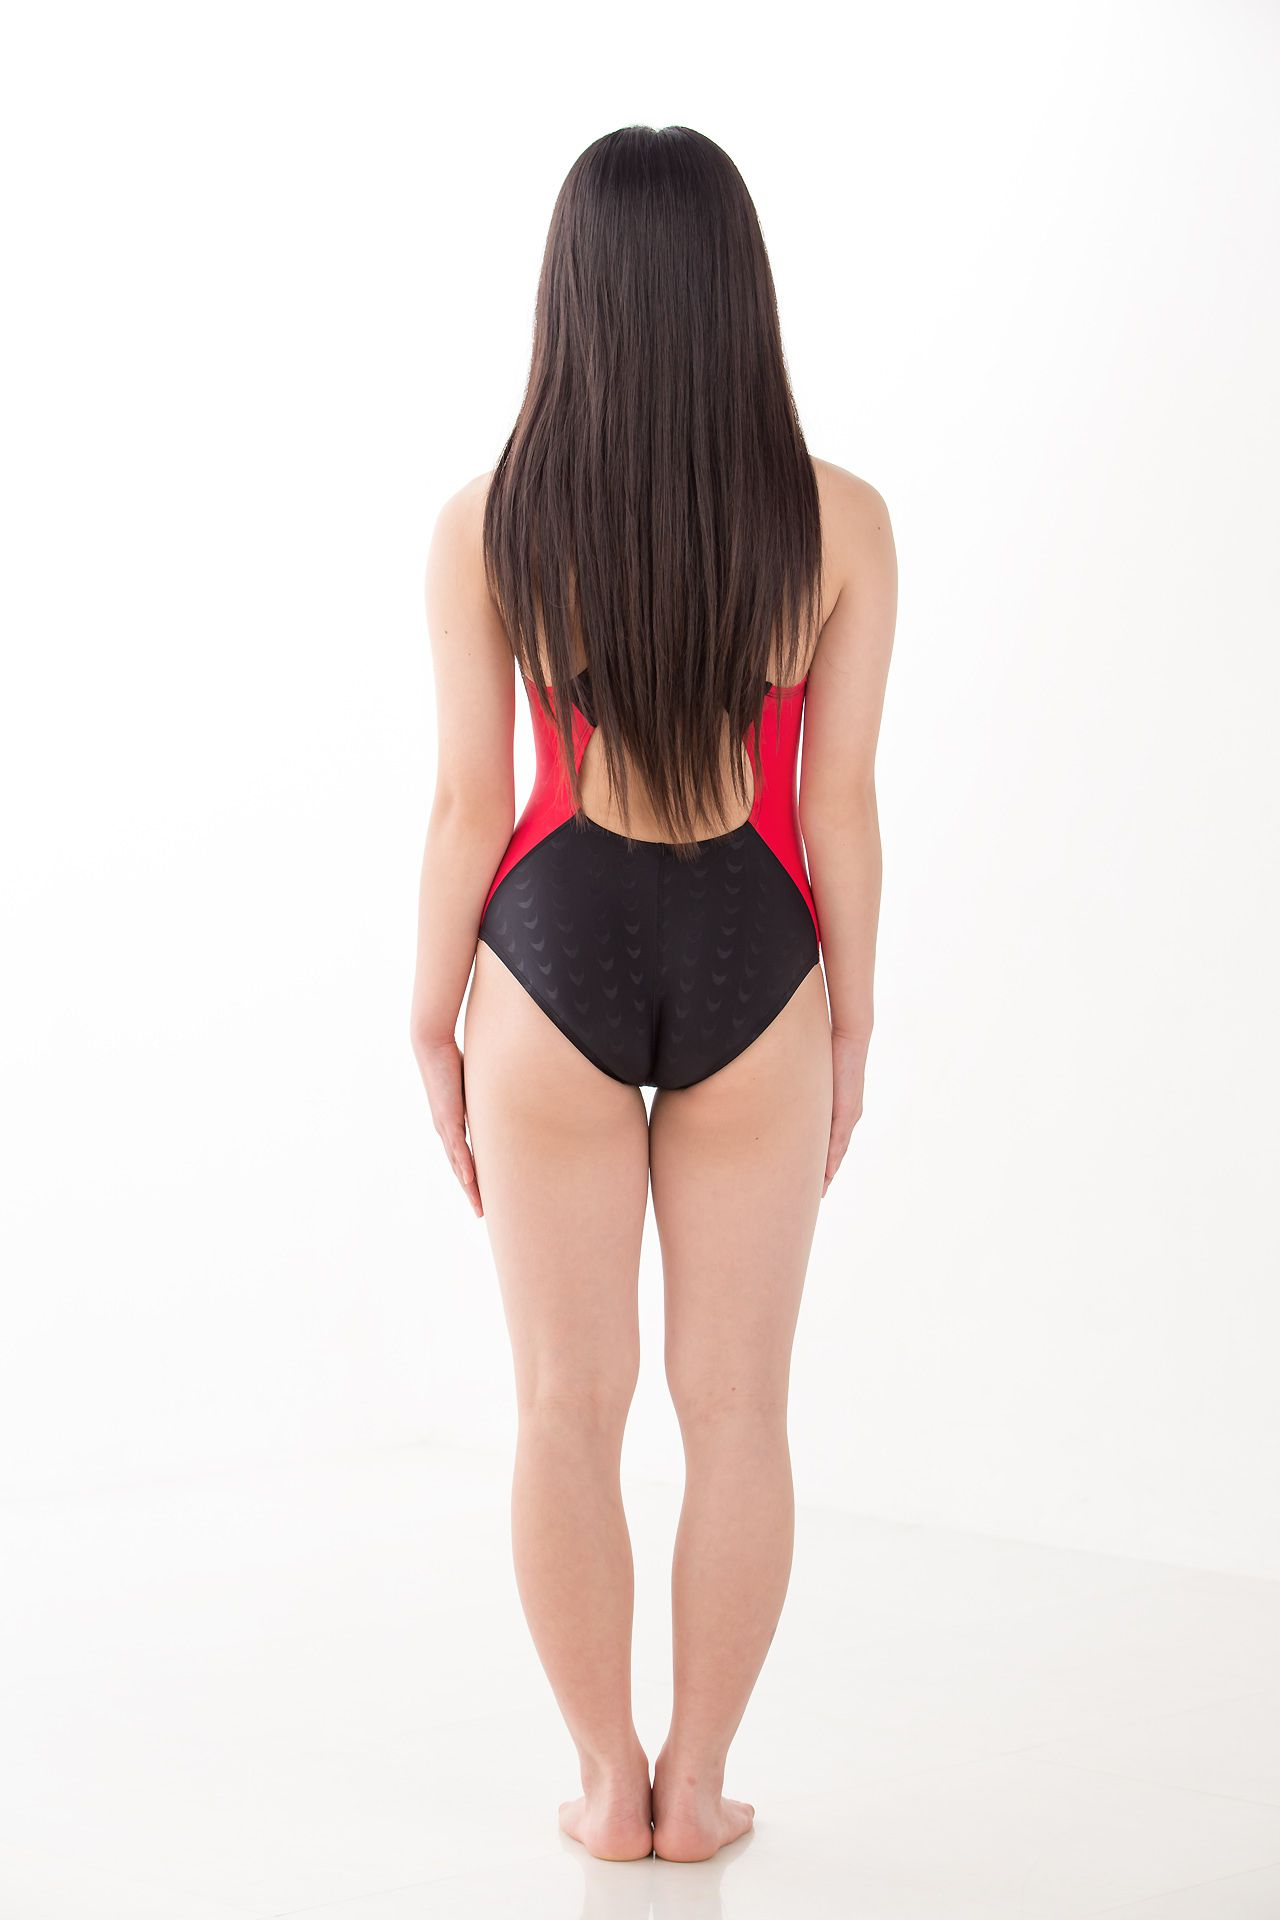 VOL.512 [Minisuka.tv]体操服:玉城ひなこ超高清写真套图(45P)